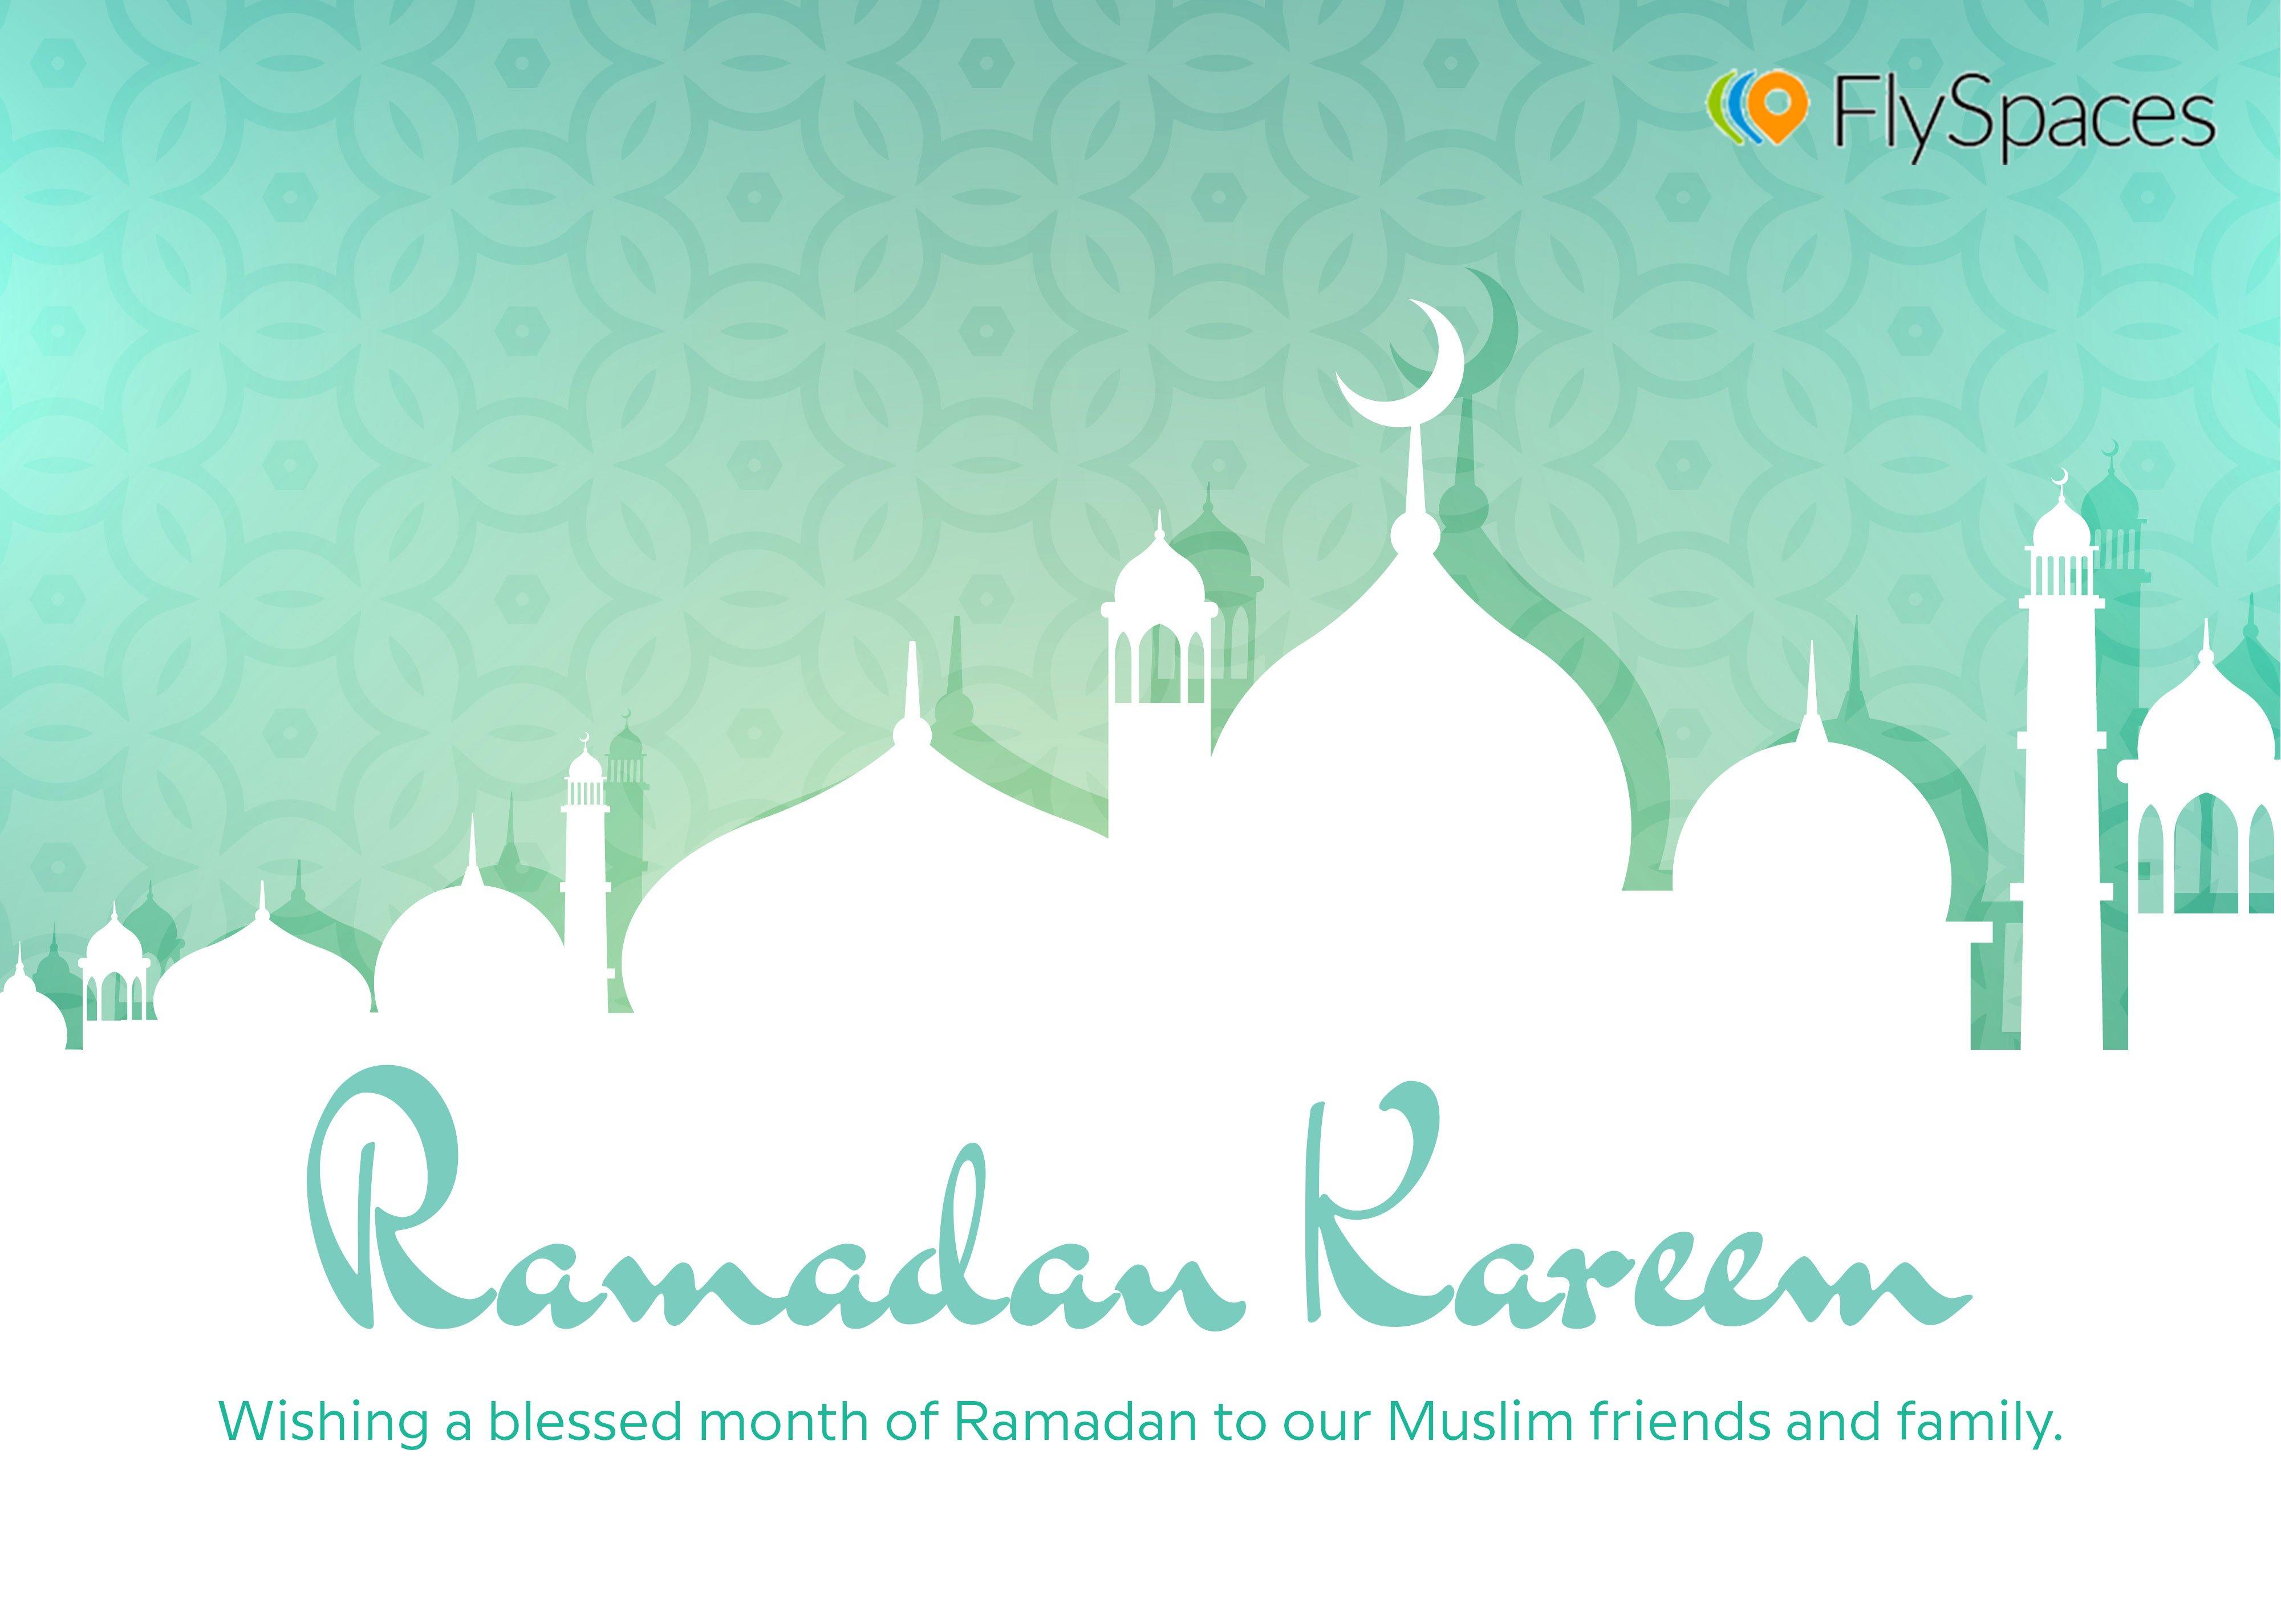 flyspaces x ramadan blog